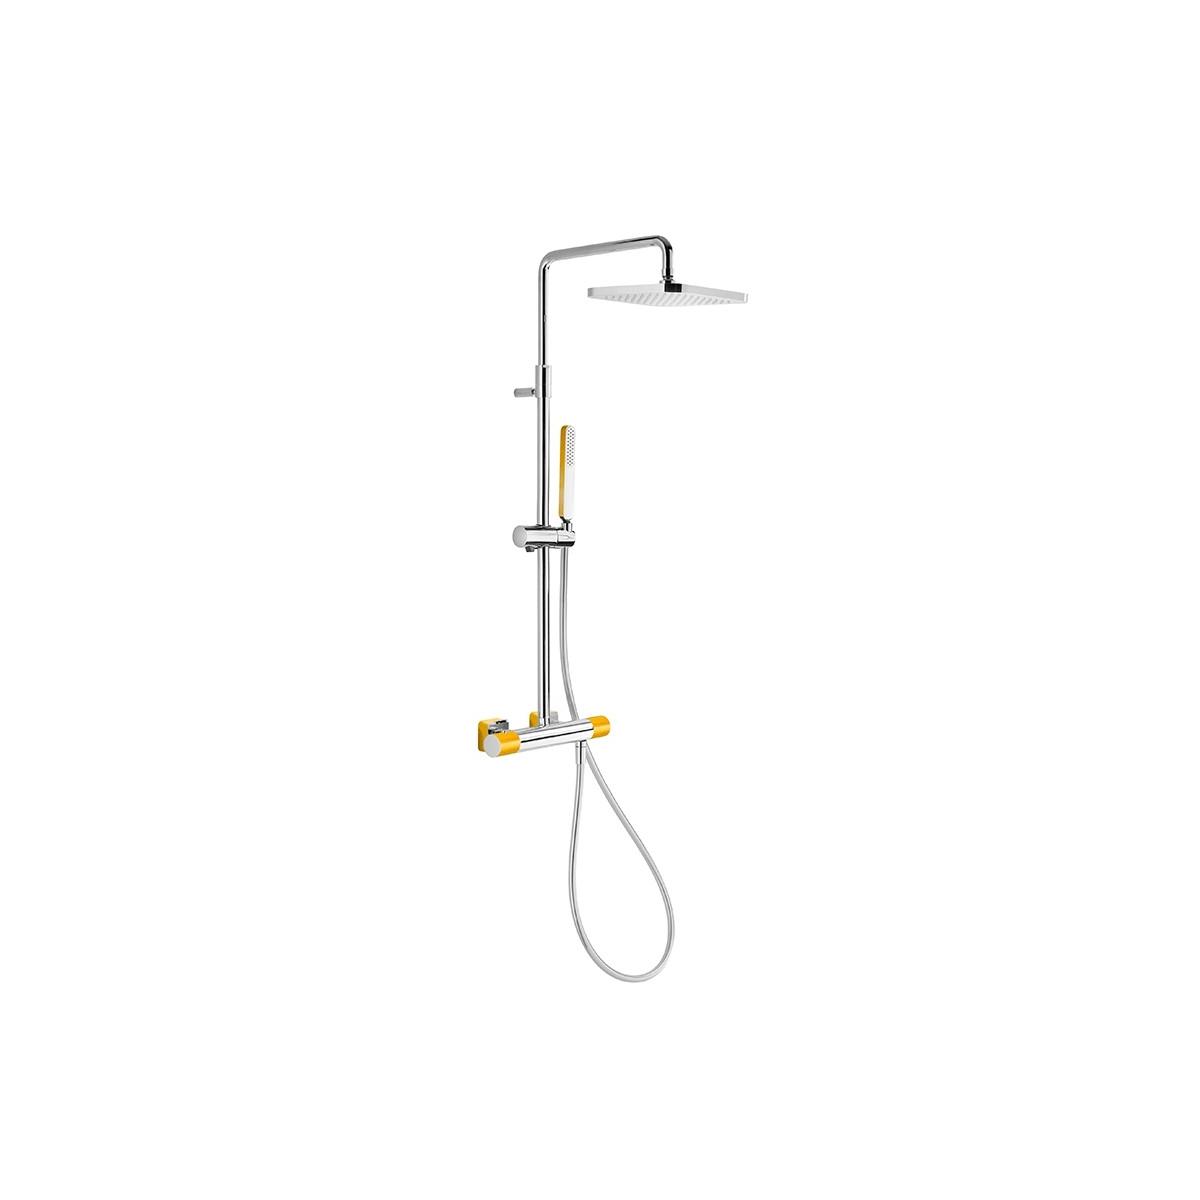 Conjunto de ducha termostática barra telescópica